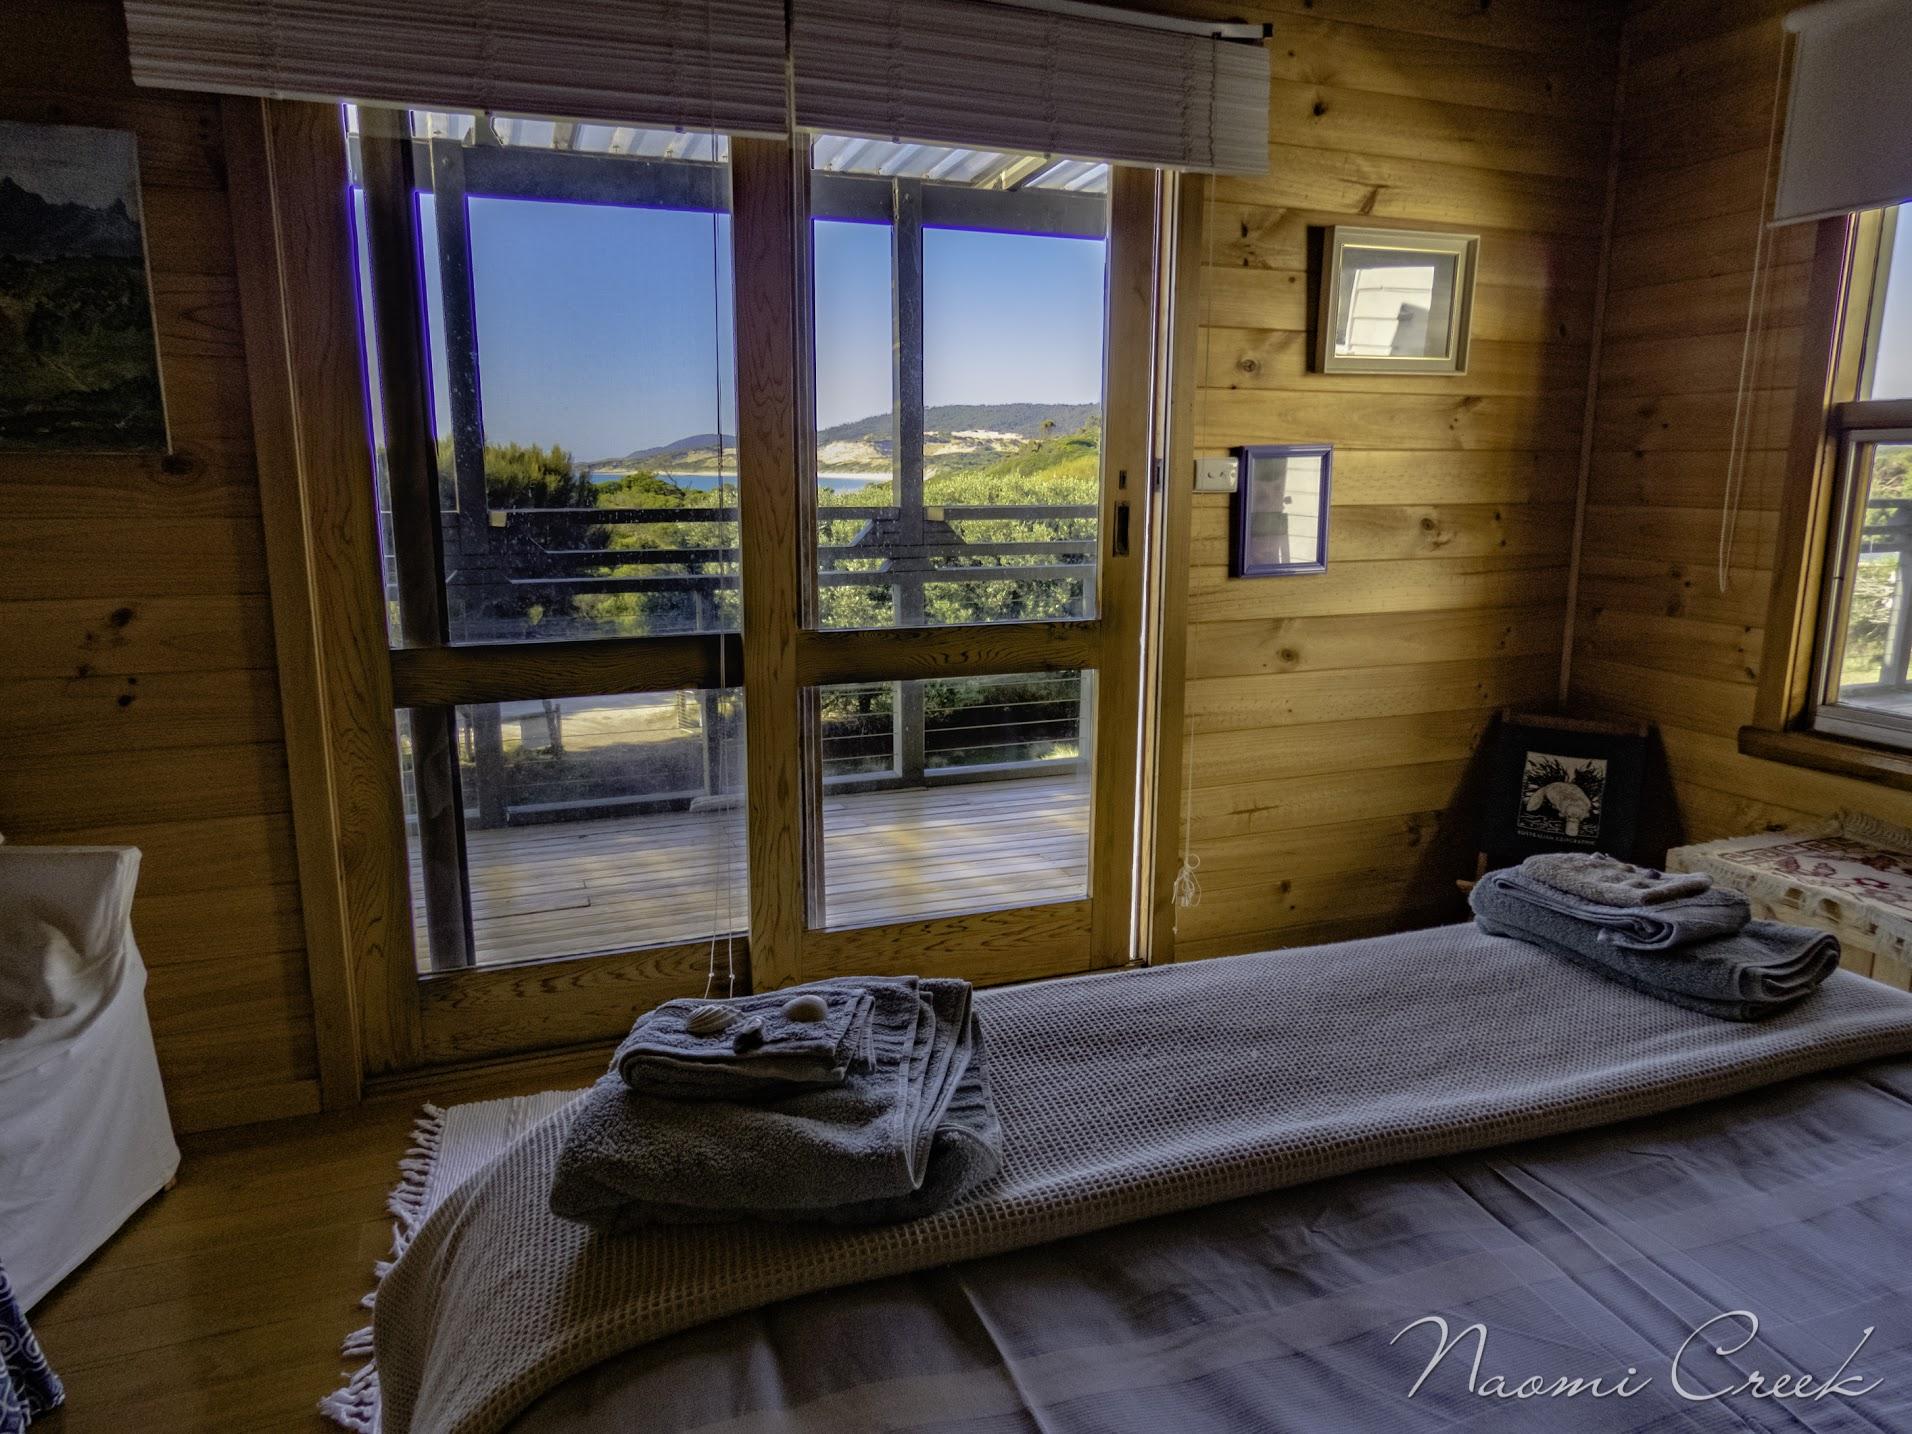 Both bedrooms have uninterrupted views of the coastline